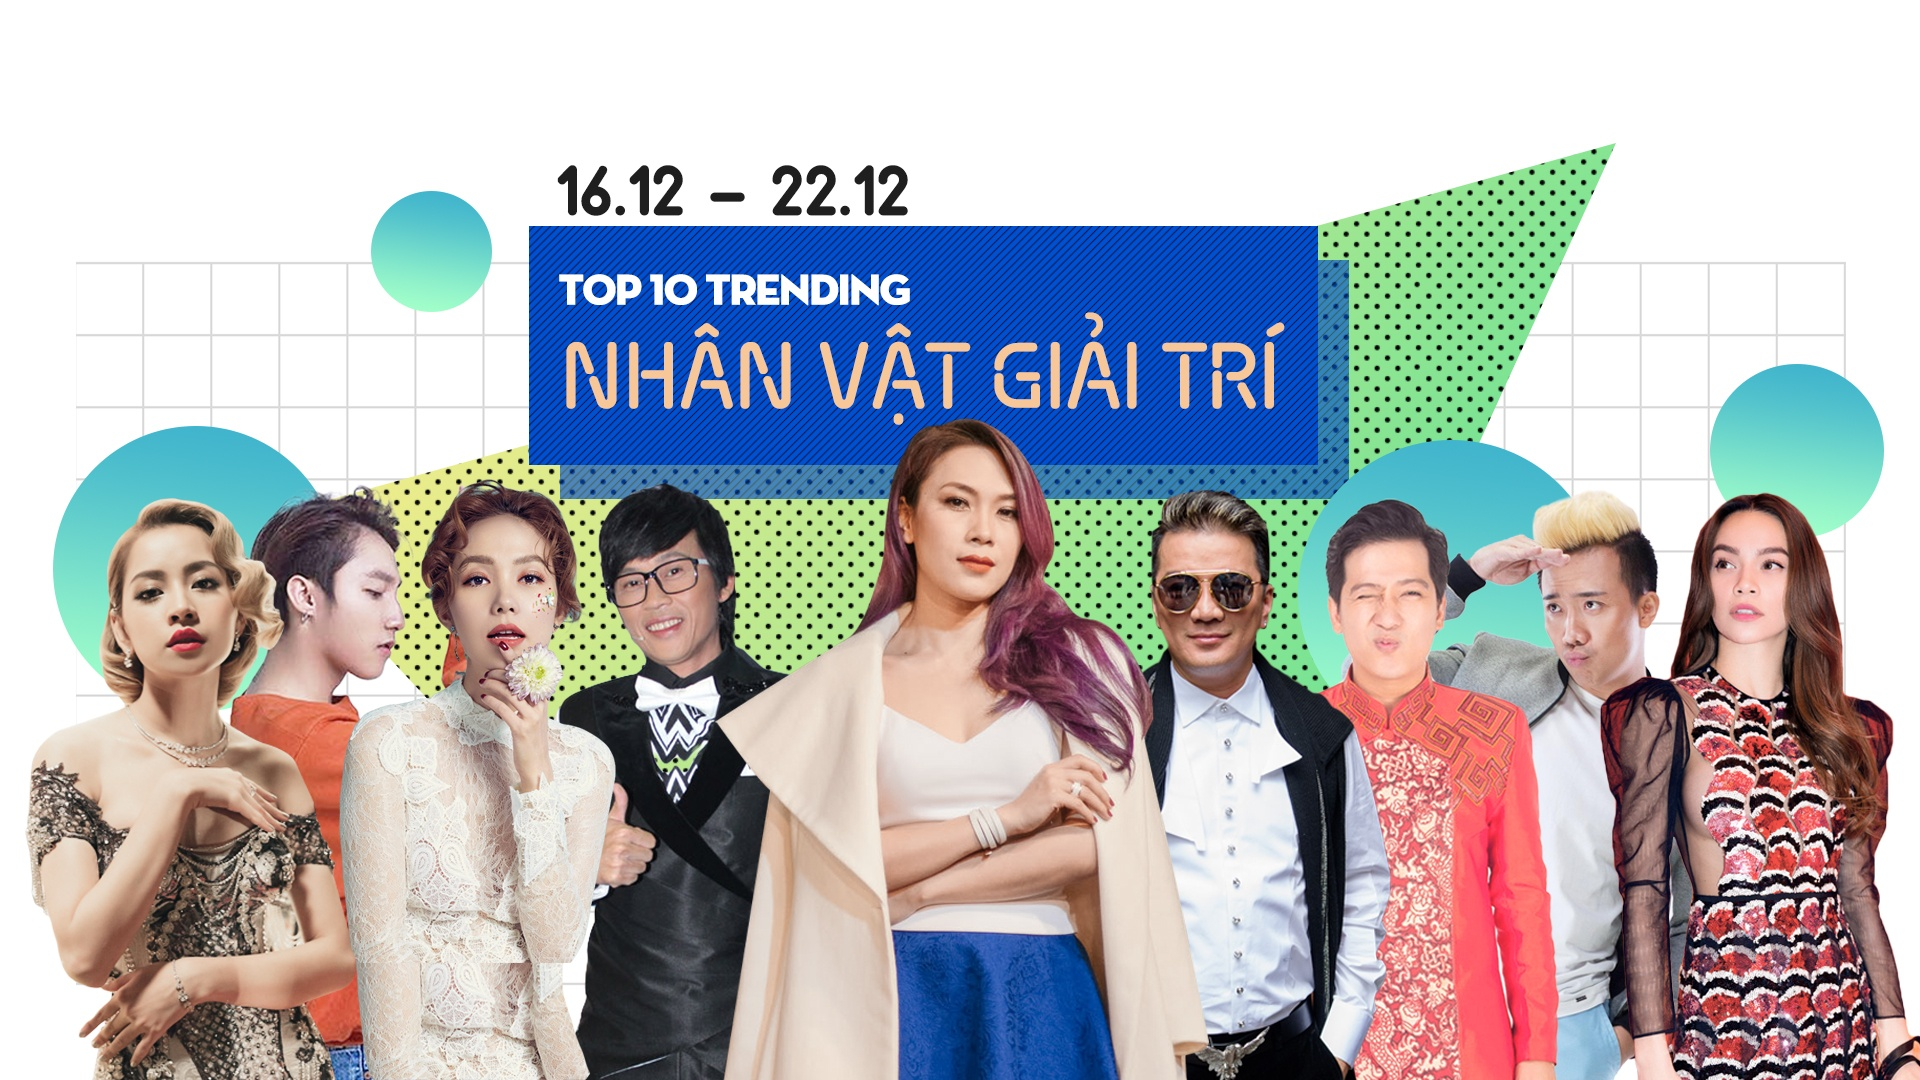 My Tam, Chi Pu giu vung suc hut tren Internet tuan qua hinh anh 1